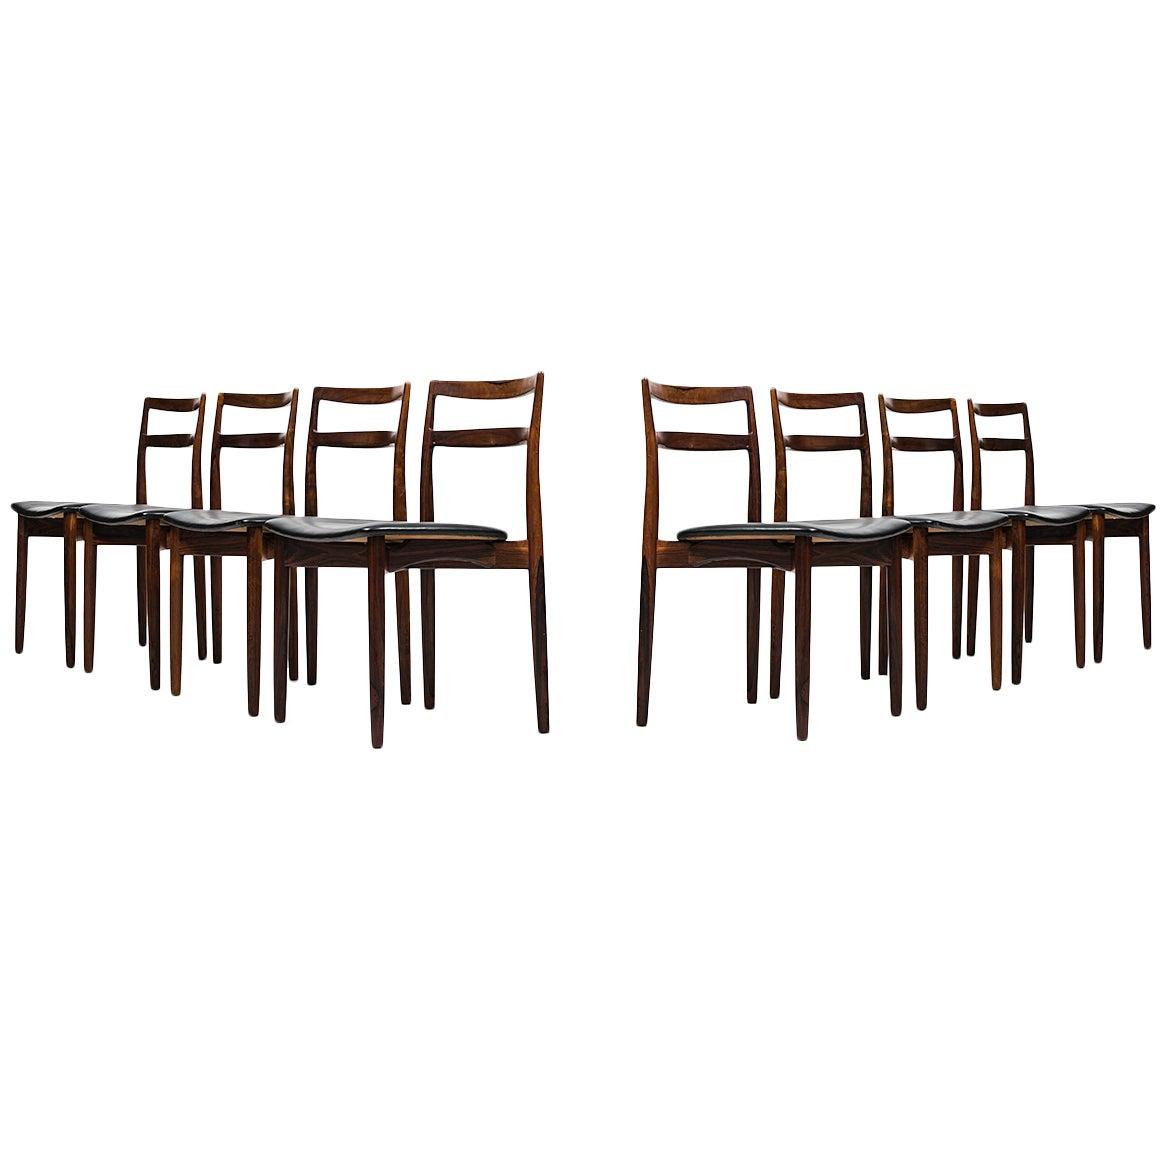 Harry Østergaard Dining Chairs Model 61 Produced by Randers Møbelfabrik